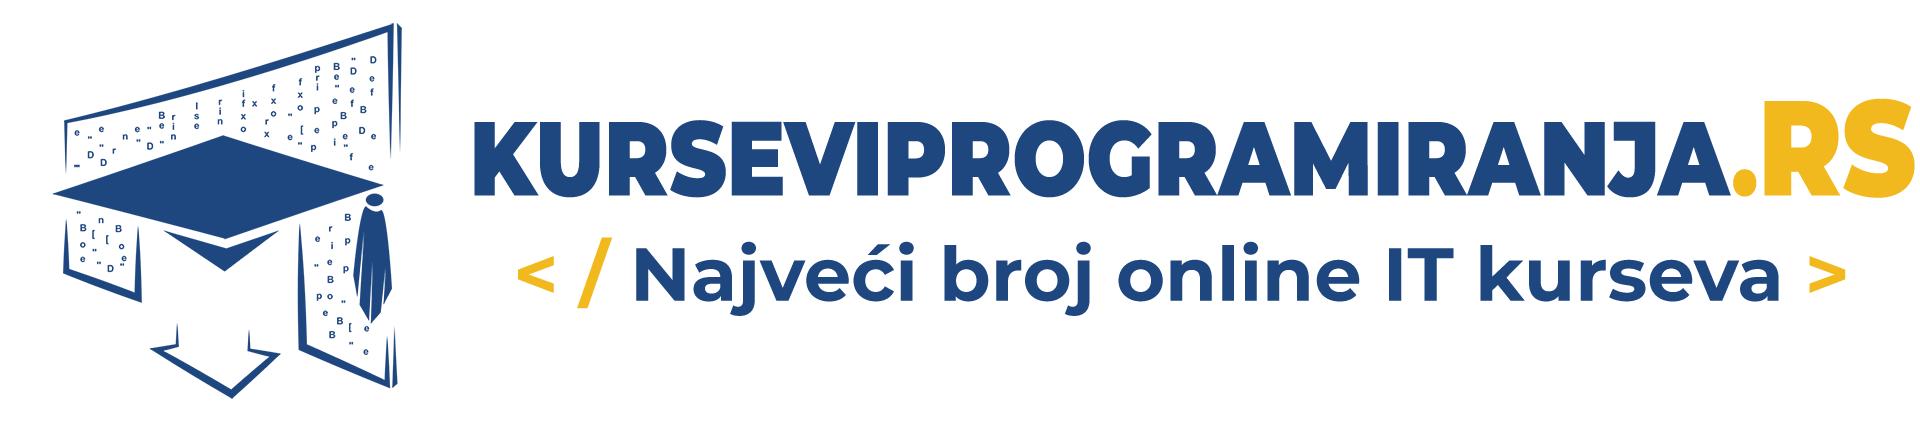 kurseviprogramiranja.rs